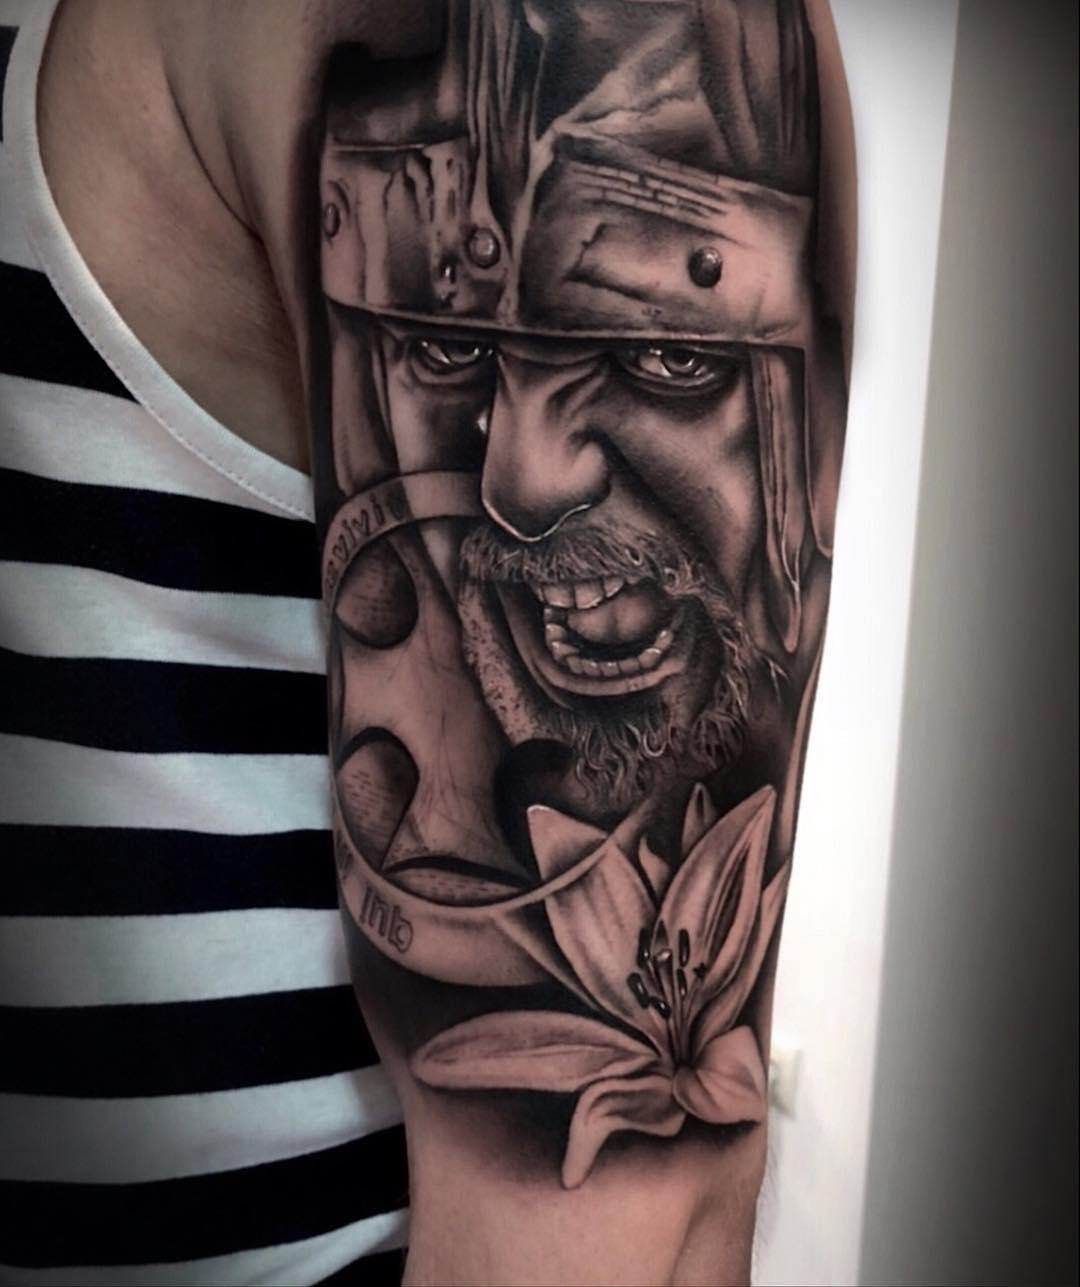 followforfollow,followmeciudadreal,ciudadreal,tomelloso,almagro,puertollano,tatuajesenpuertollano,tatuajesendaimiel,ciudadrealtattoo,ciudadrealtatuajes,tatuajesciudadreal,follow,ciudadrealtatuajes,puertollano,ciudadreal,tattoos,ciudadrealtattoo,tattooers,besttattooers,juantabasco,ciudadrealsetatua,ink,tatuajes,realismo,realistictattoo,ciudadrealtattoo,tatuajesenpuertollano,traditionaltattoos,castillalamancha,inked,inkedlife,inkedsociety,art,amazingink,tattooart,oldlines